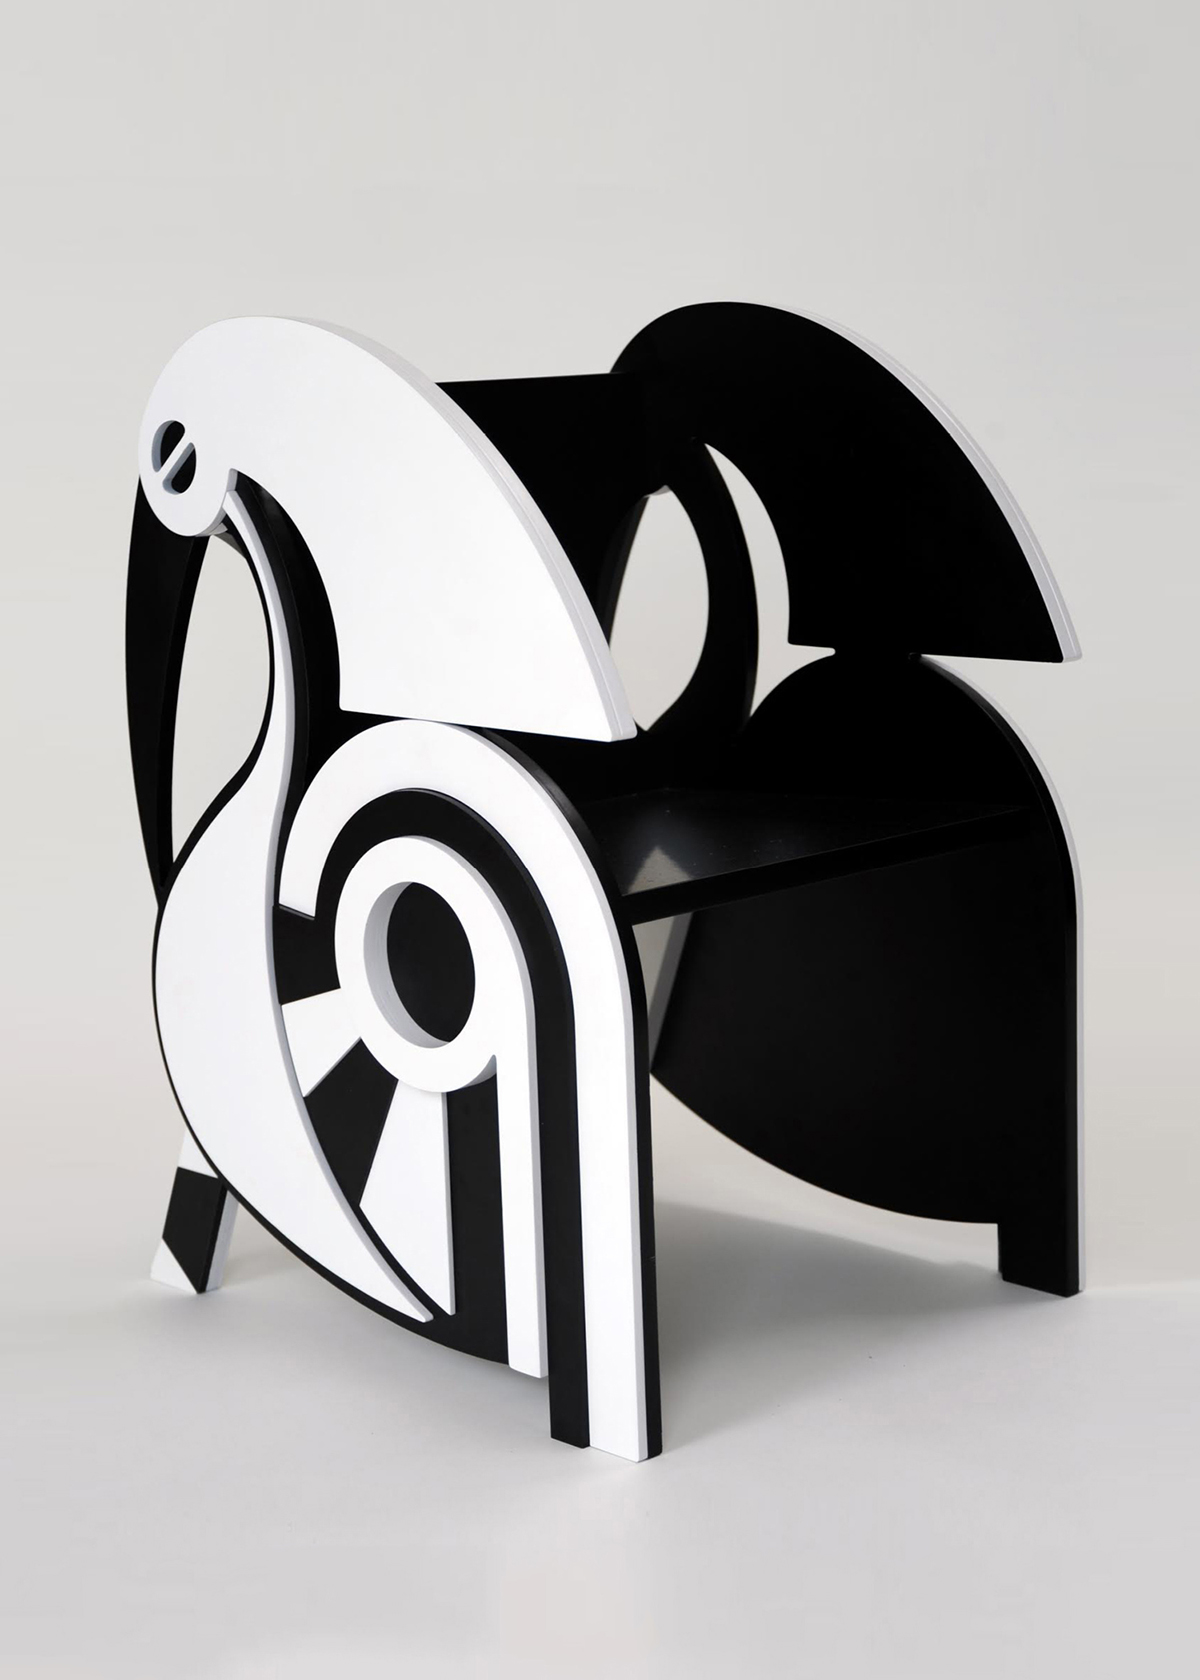 Crawl-chair-Materiallust-New-York-Design-Week-Collective-Childrens-Furniture-8.jpg